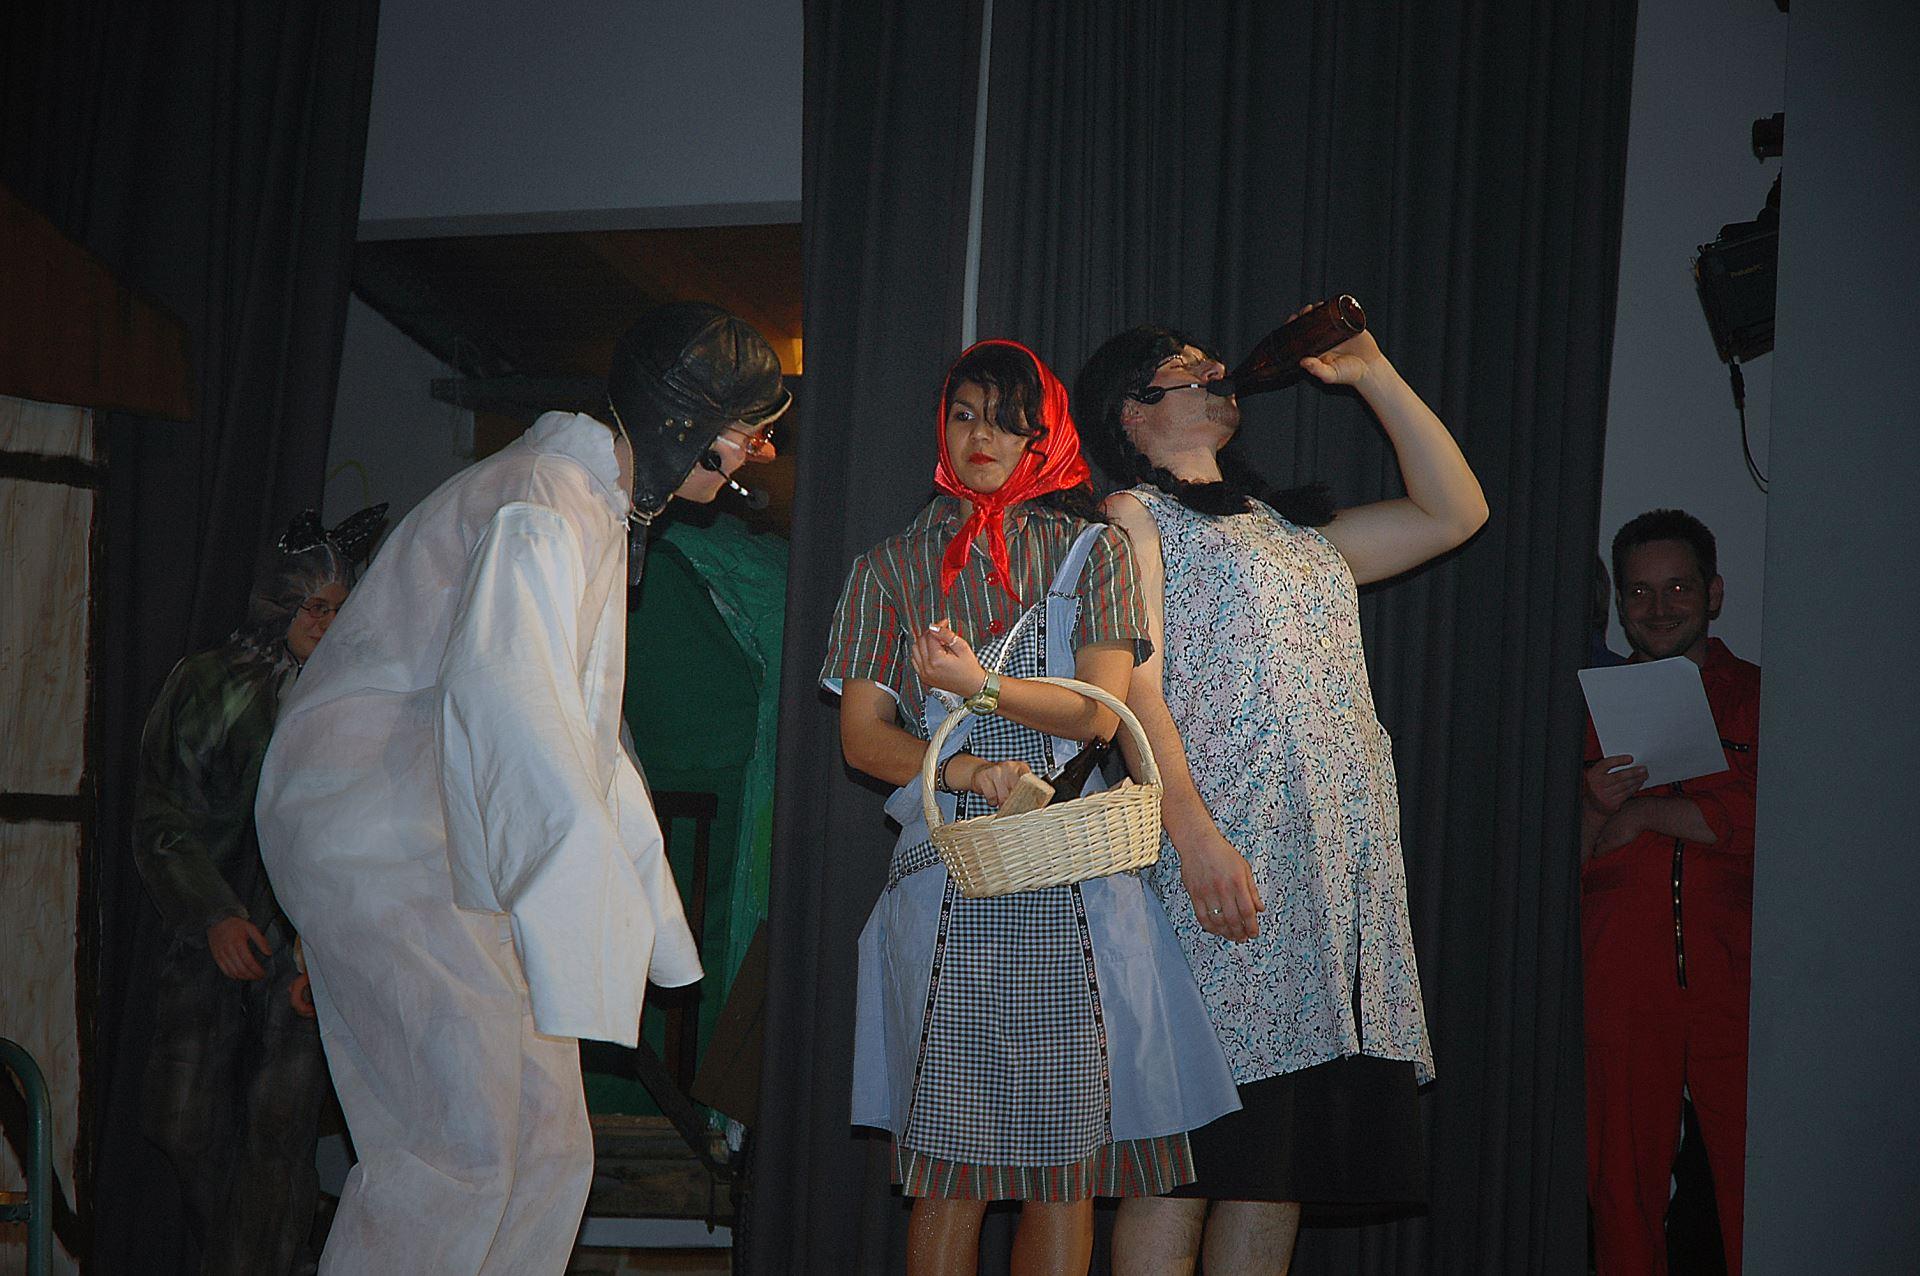 Fasentsitzung in Langenbrand 2006 (51)